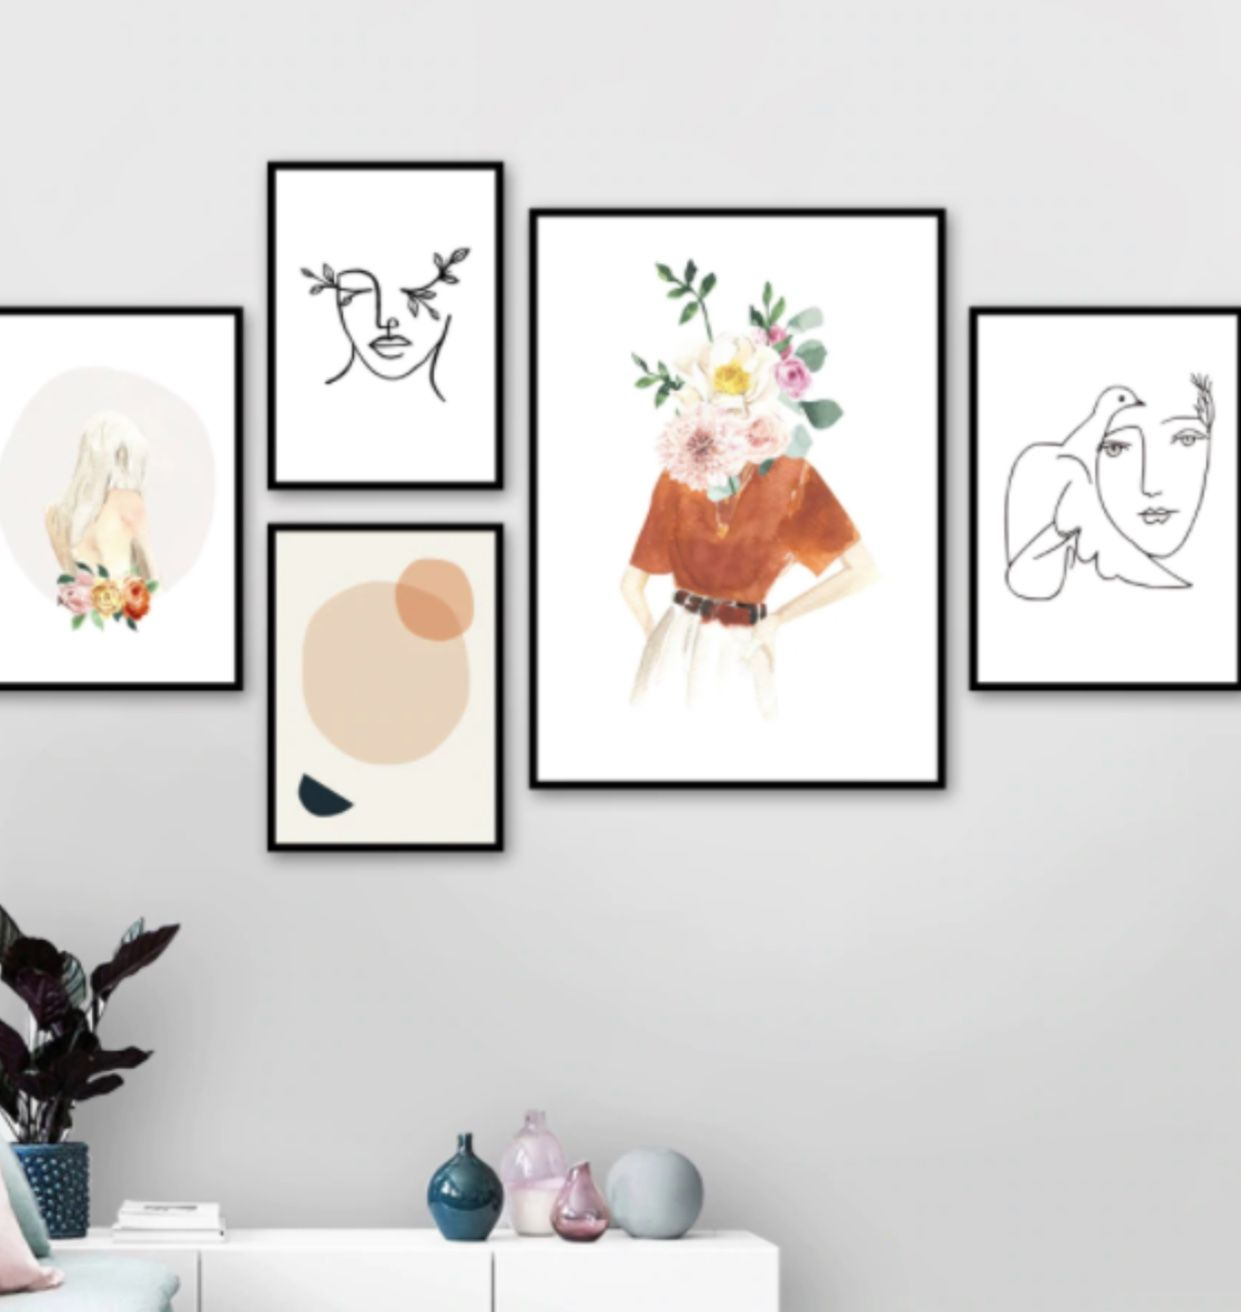 Minimal Divine Feminine Wall Art In 2020 Feminine Wall Art Minimal Wall Art Wall Art